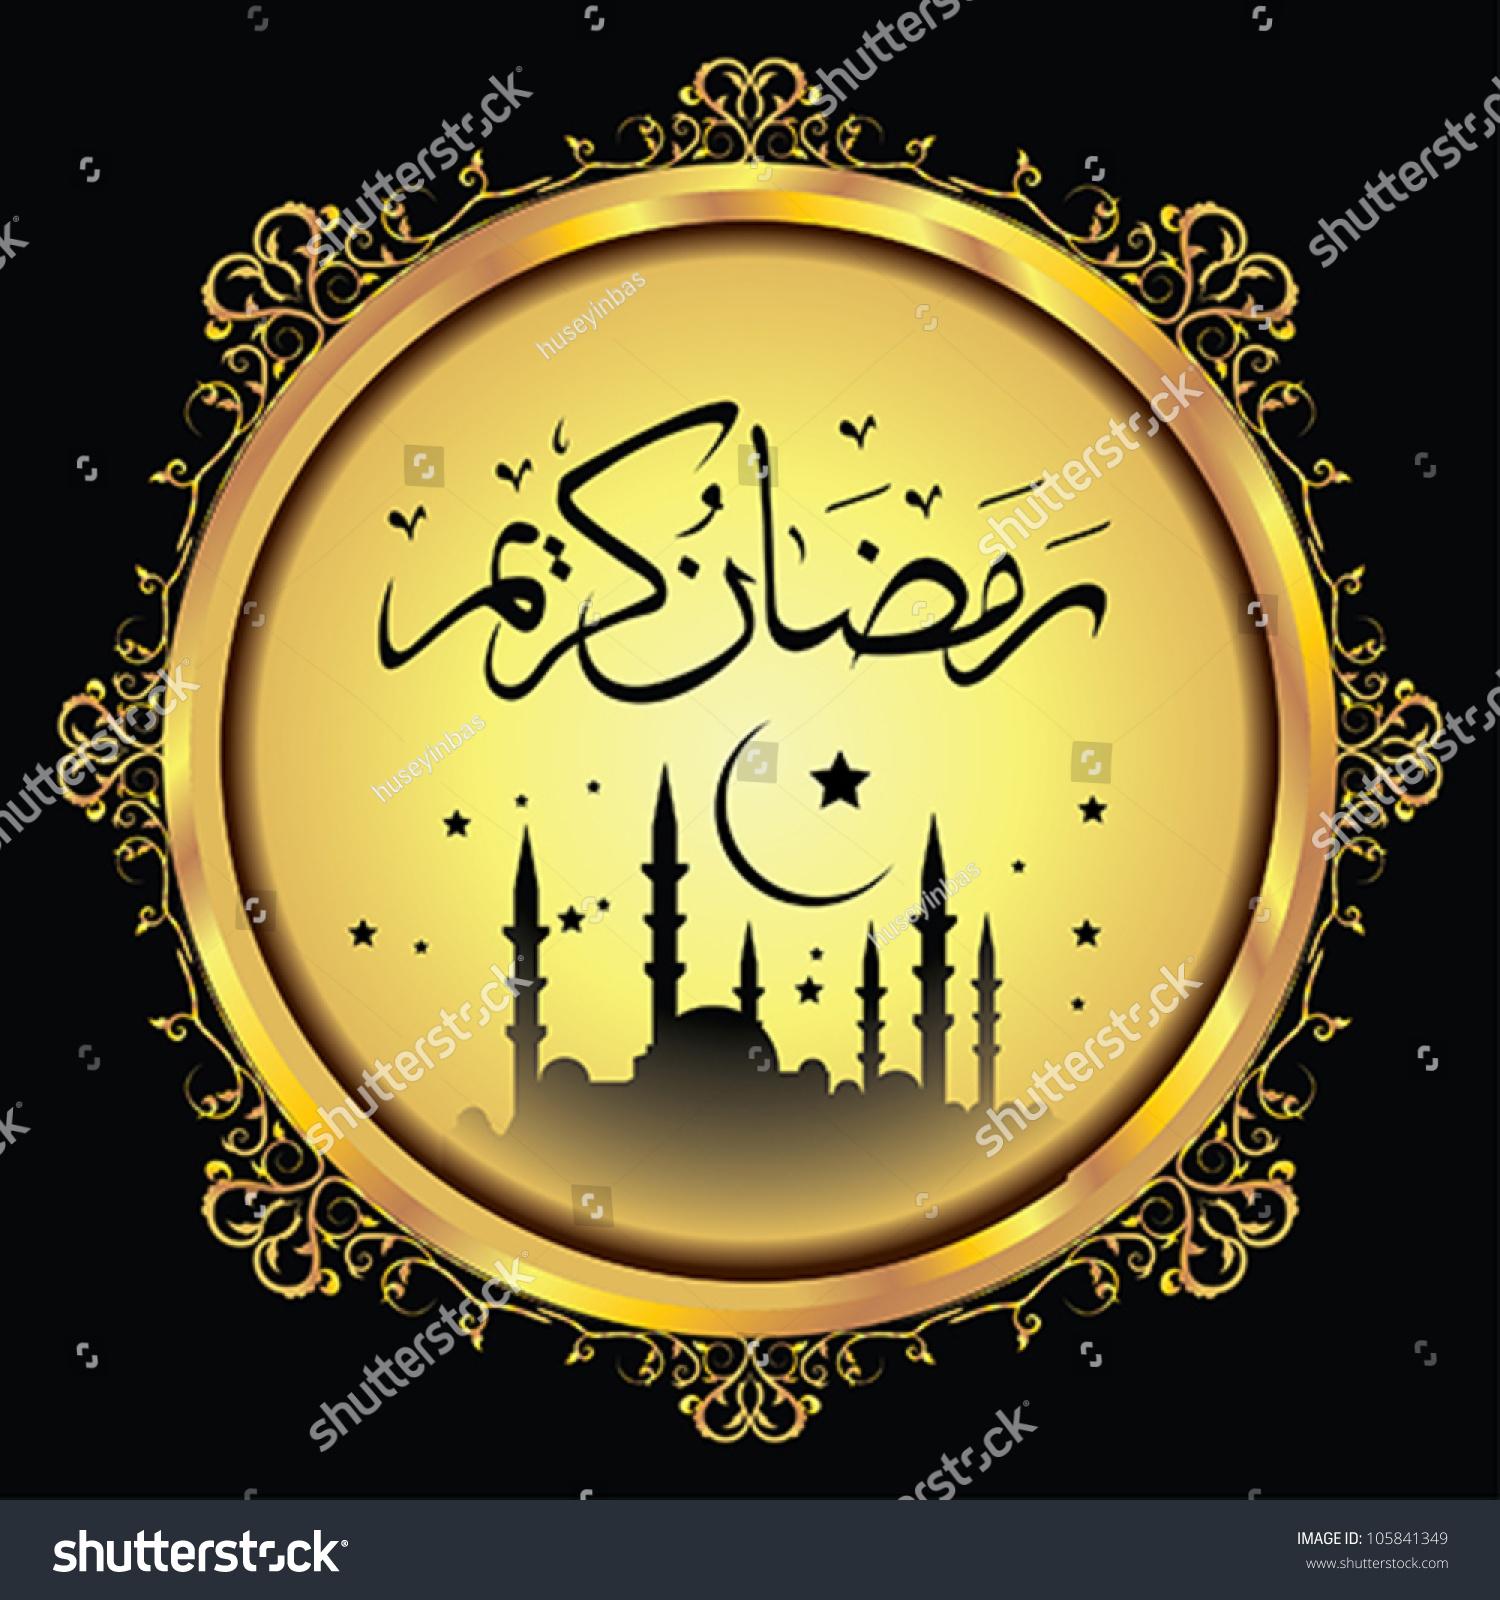 Ramadan greetings arabic script islamic greeting stock vector ramadan greetings in arabic script an islamic greeting card for holy month of ramadan kareem kristyandbryce Images